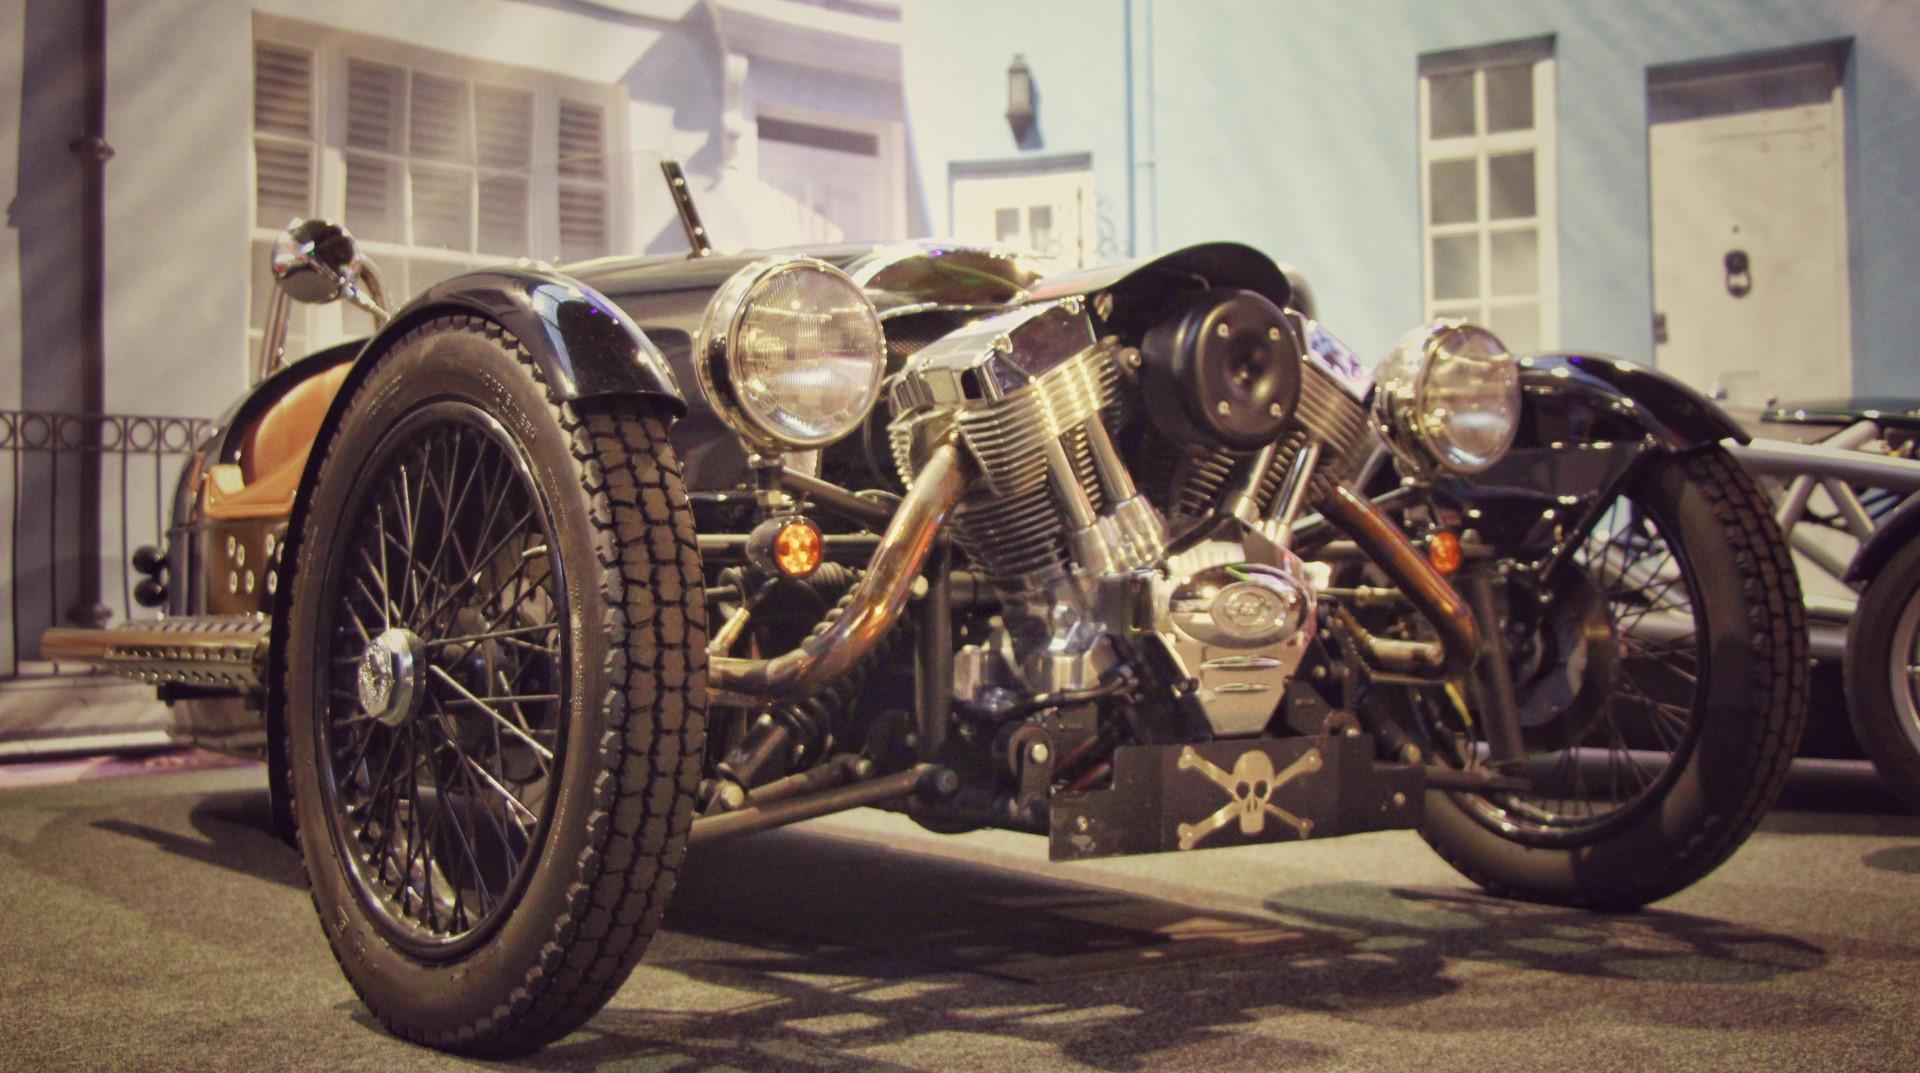 nous-avons-visite-so-british-cars-amp-lifestyle-1179-12.jpeg